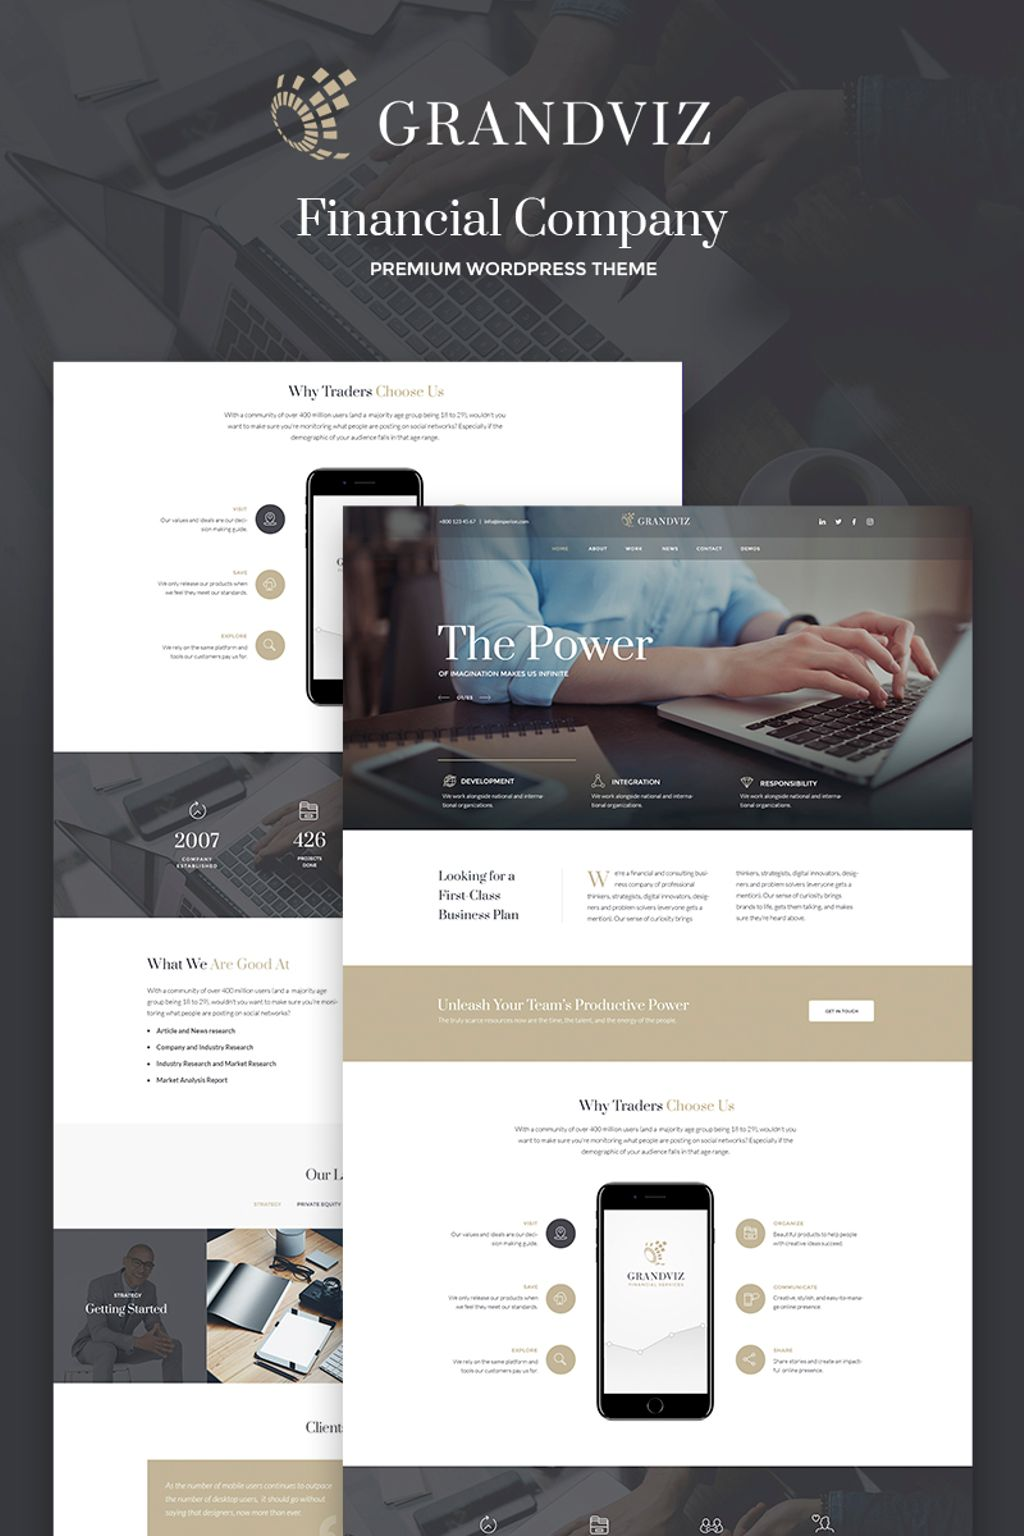 Grandviz - Financial Company Premium WordPress Theme - screenshot